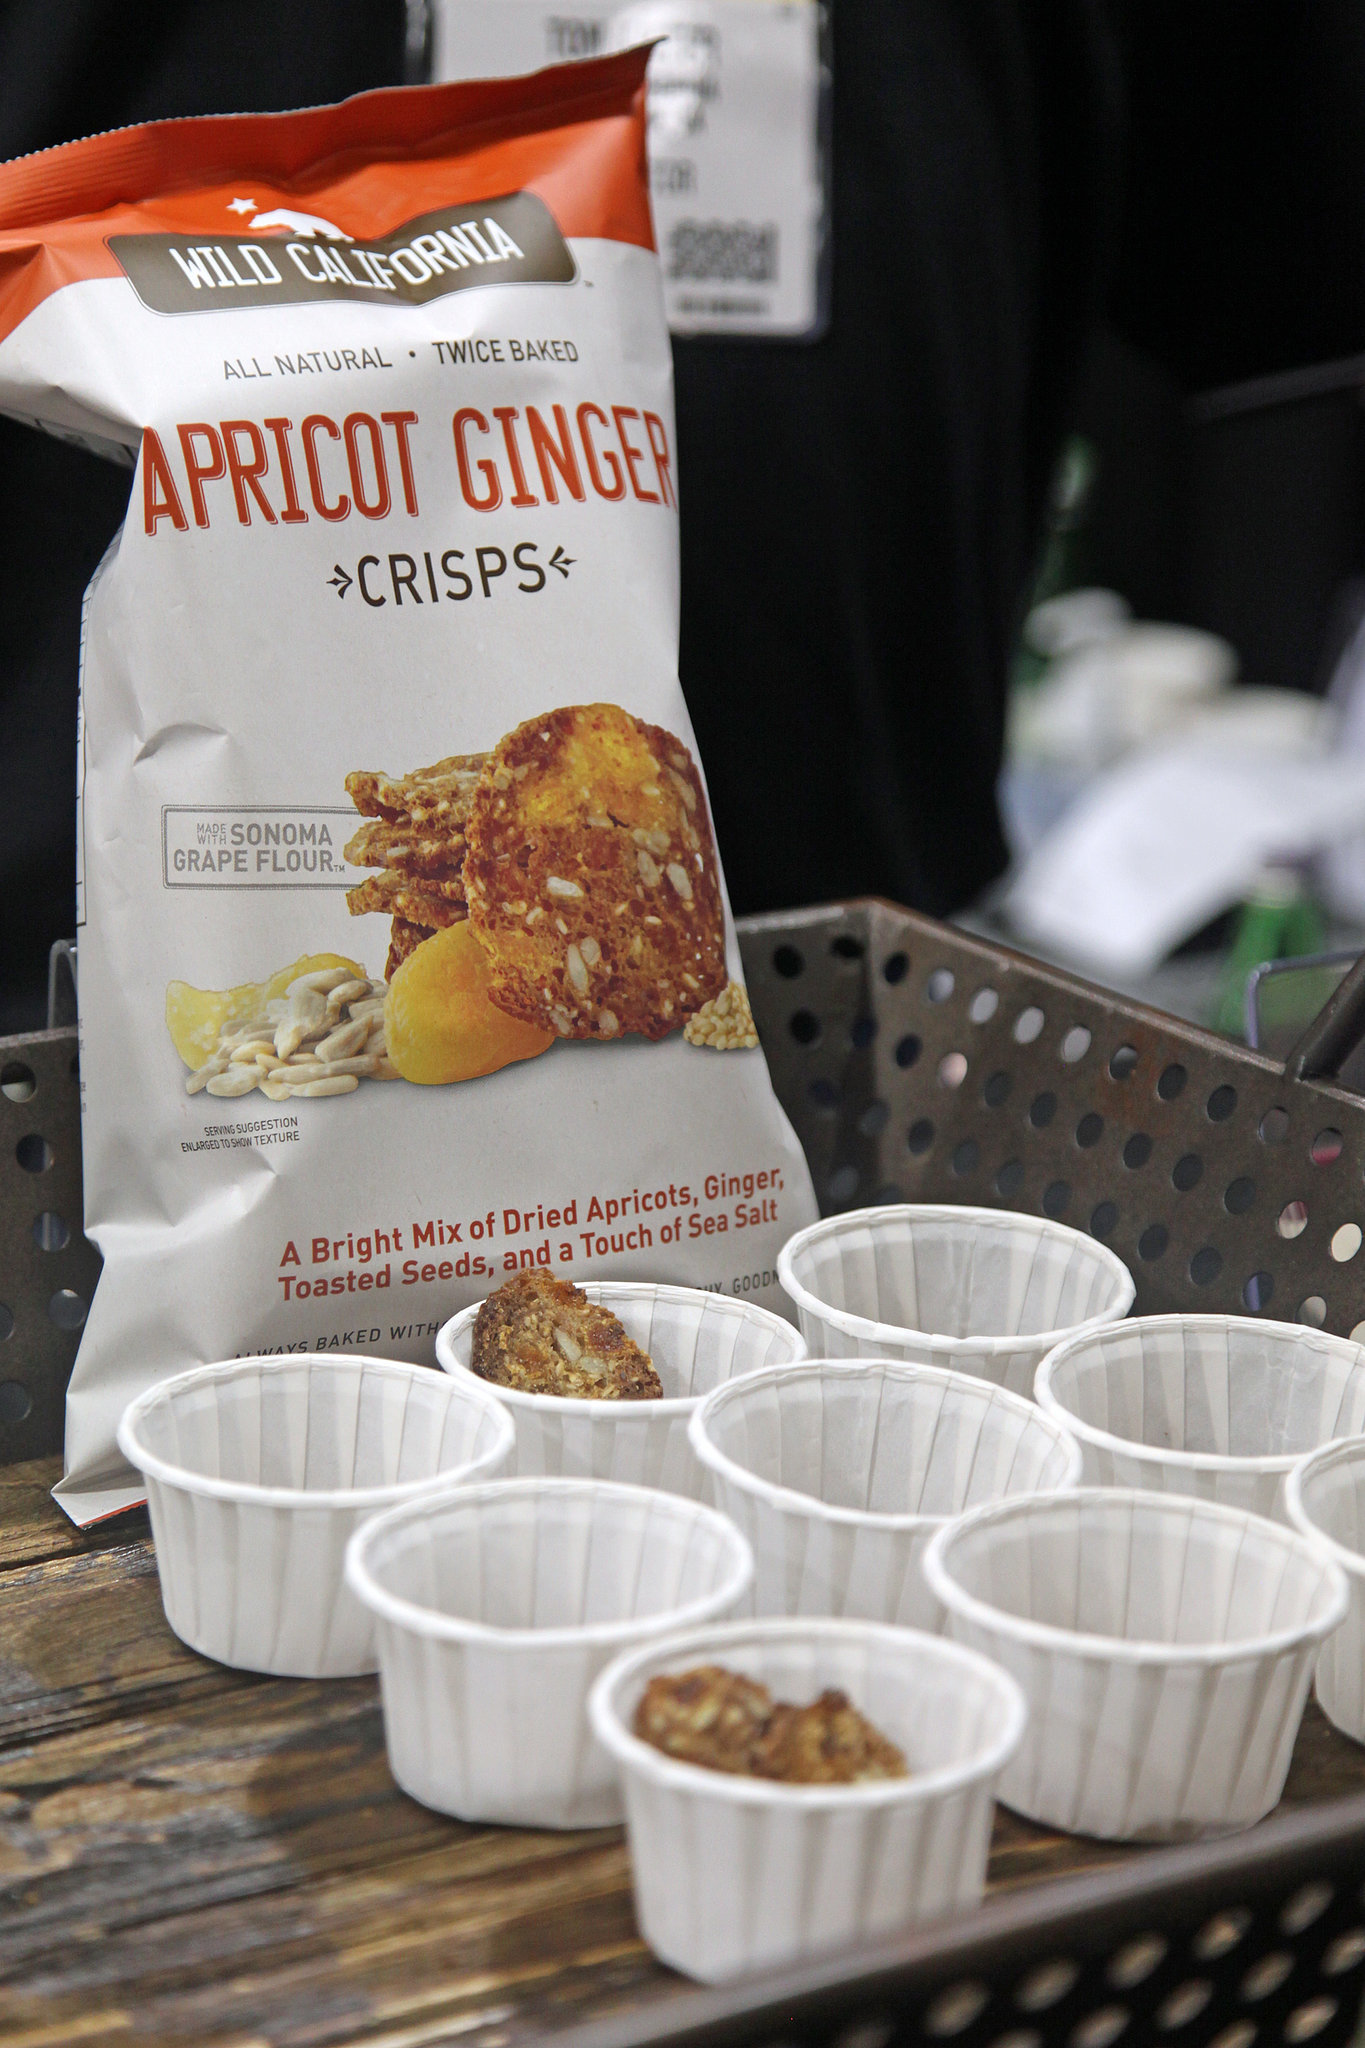 Wild California Crisps Whole Foods